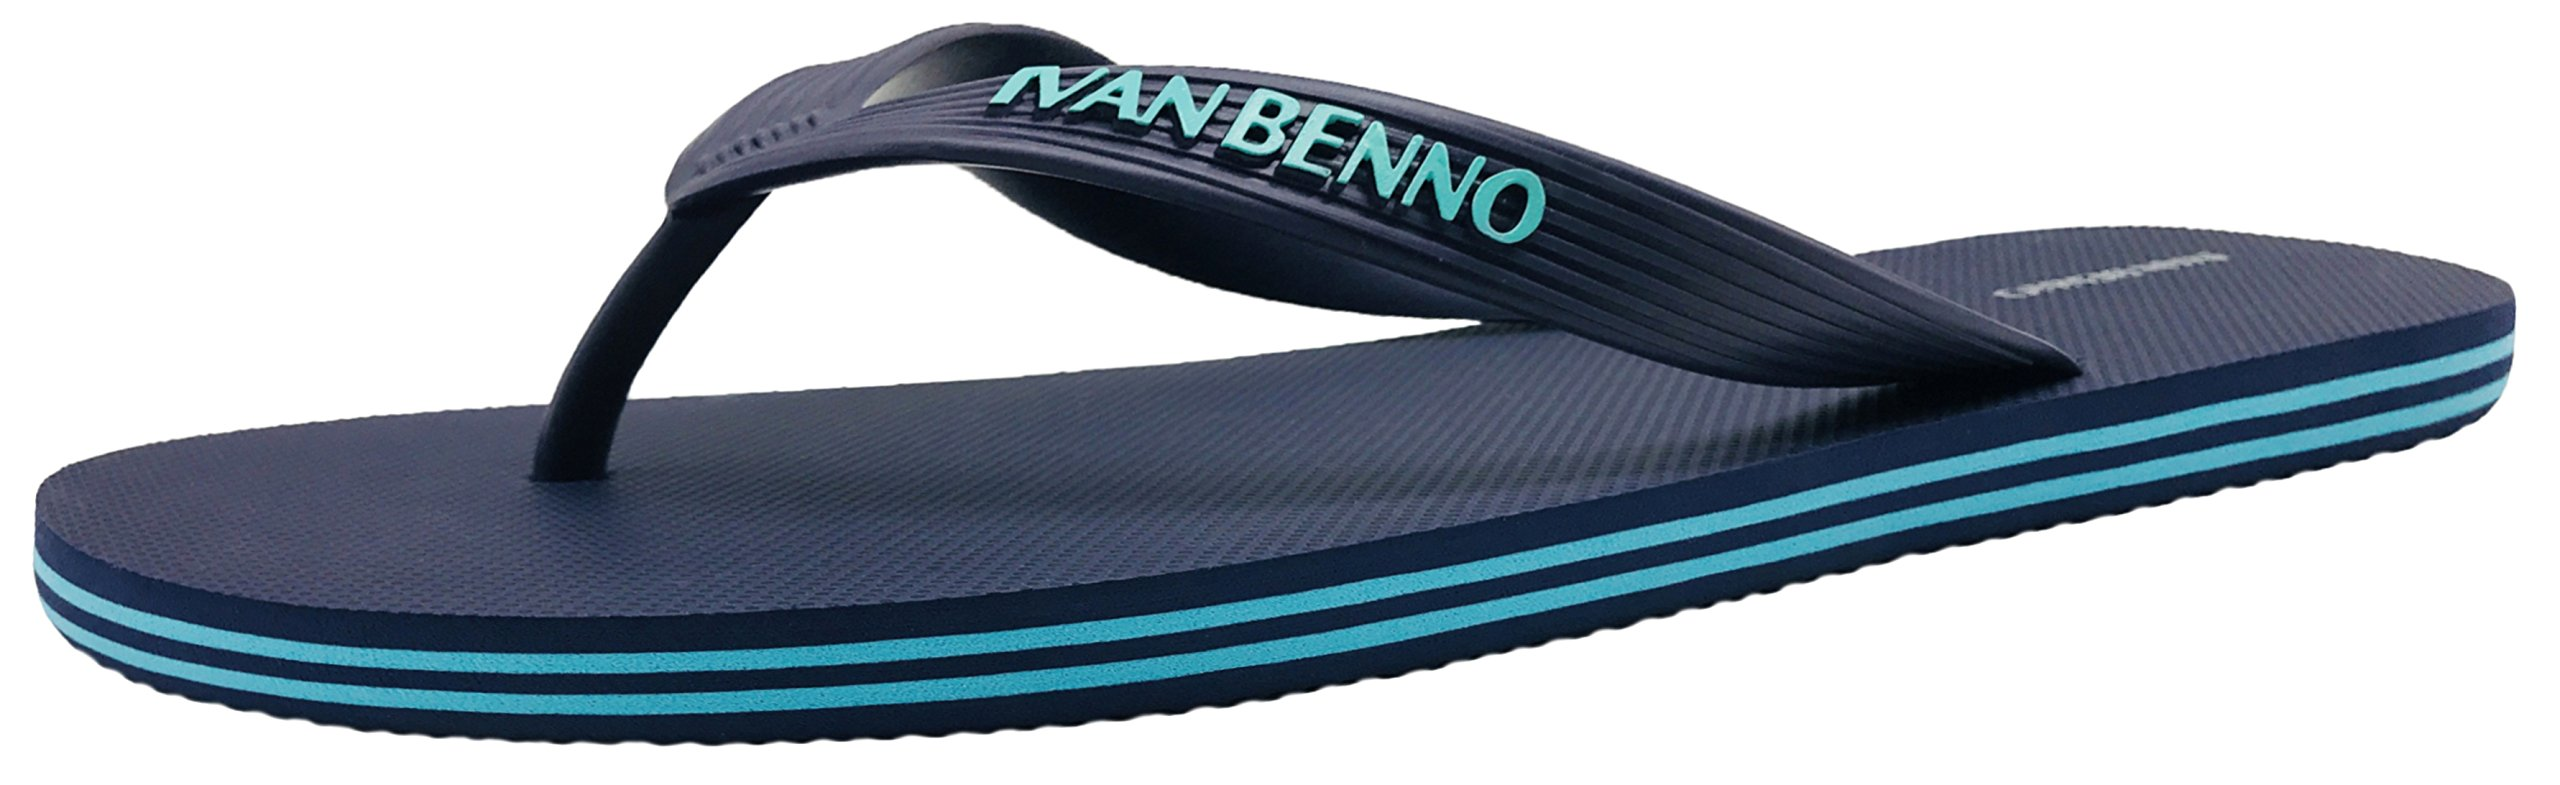 Finoceans Sport Flip Flops Sandals Mens' Tong, Navy, 8D(M)